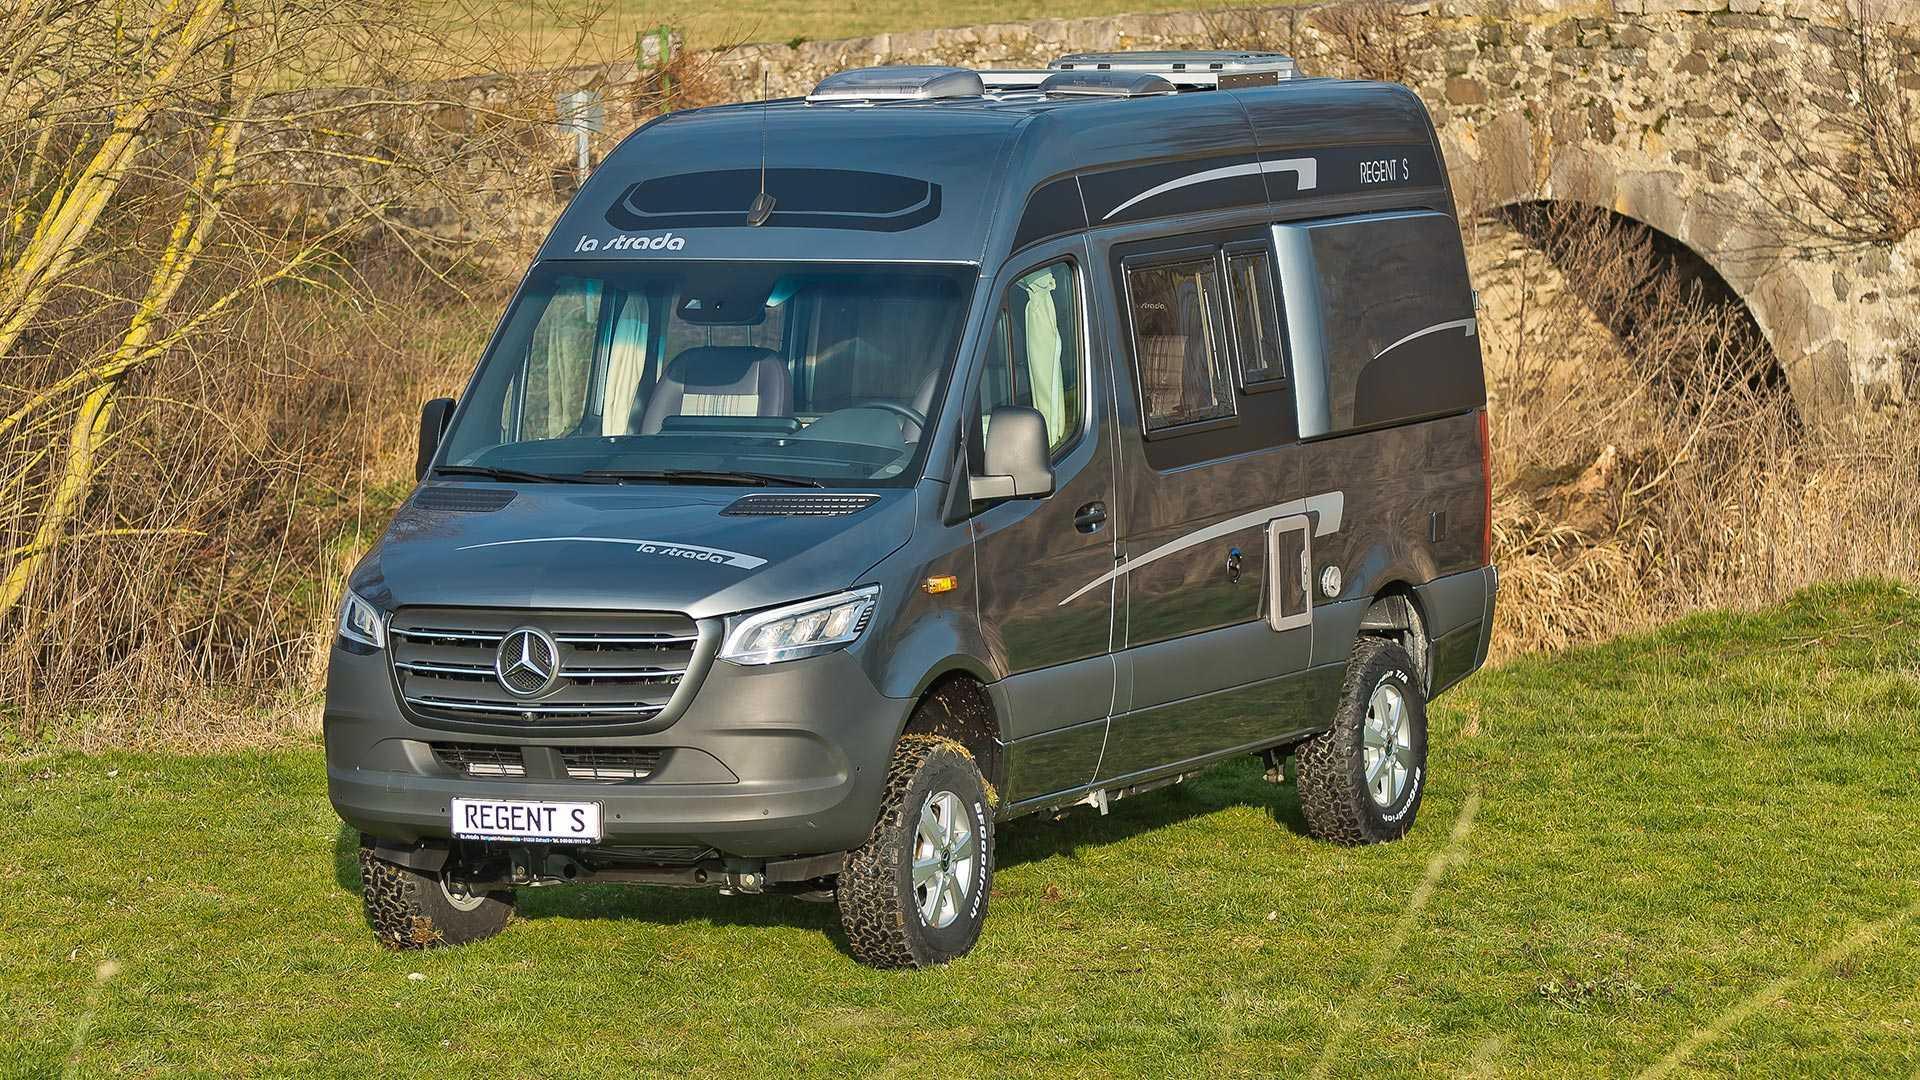 La Camper Definitiva Bien Podria Ser Esta Mercedes Sprinter 4x4 De La Strada Video Foto 4 De 15 Diariomotor